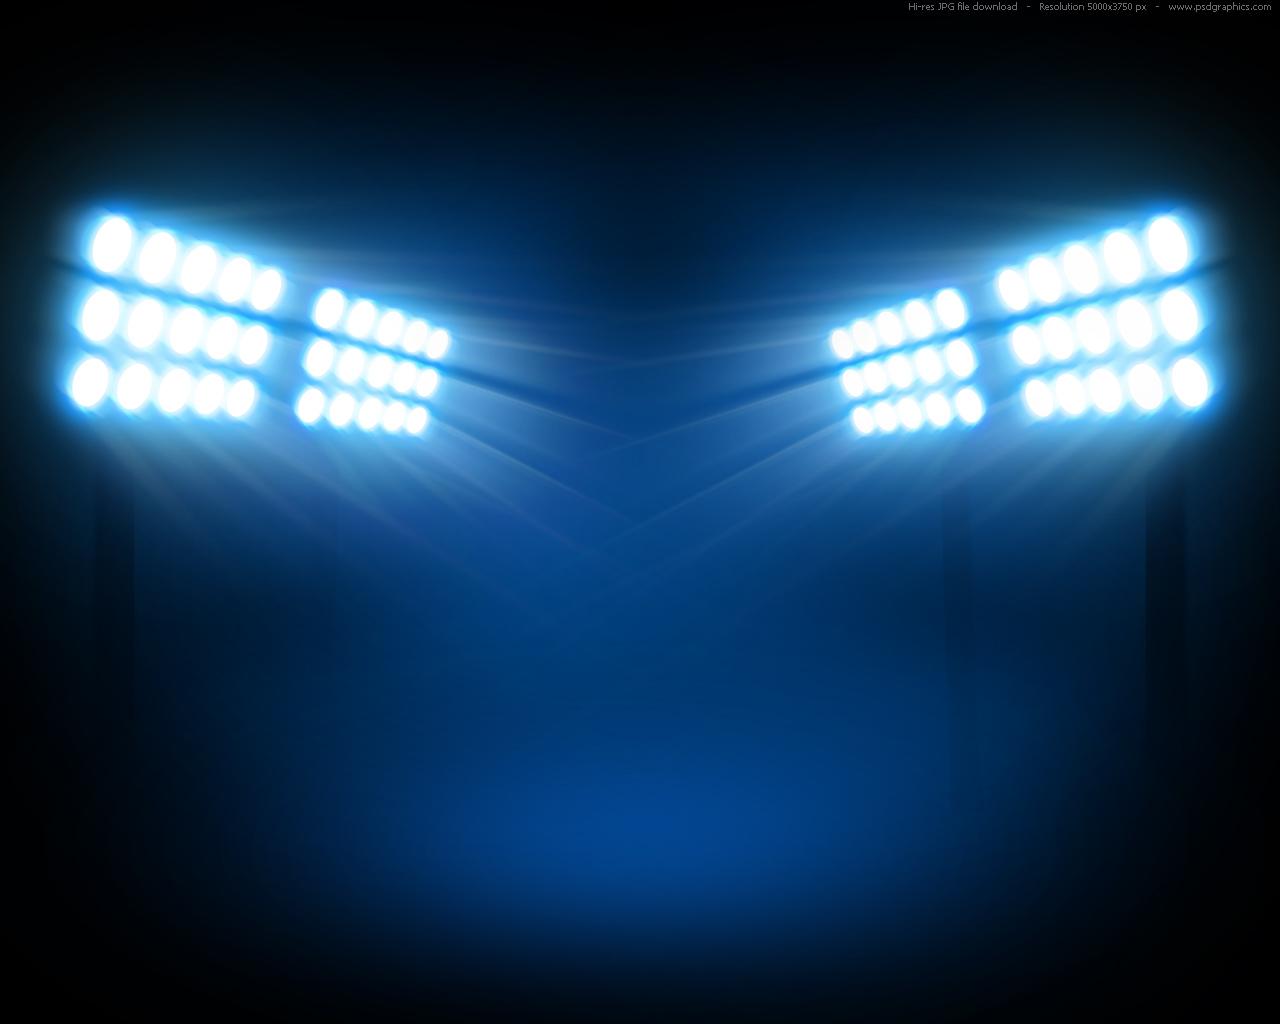 Stadium floodlights backgrounds PSDGraphics 1280x1024